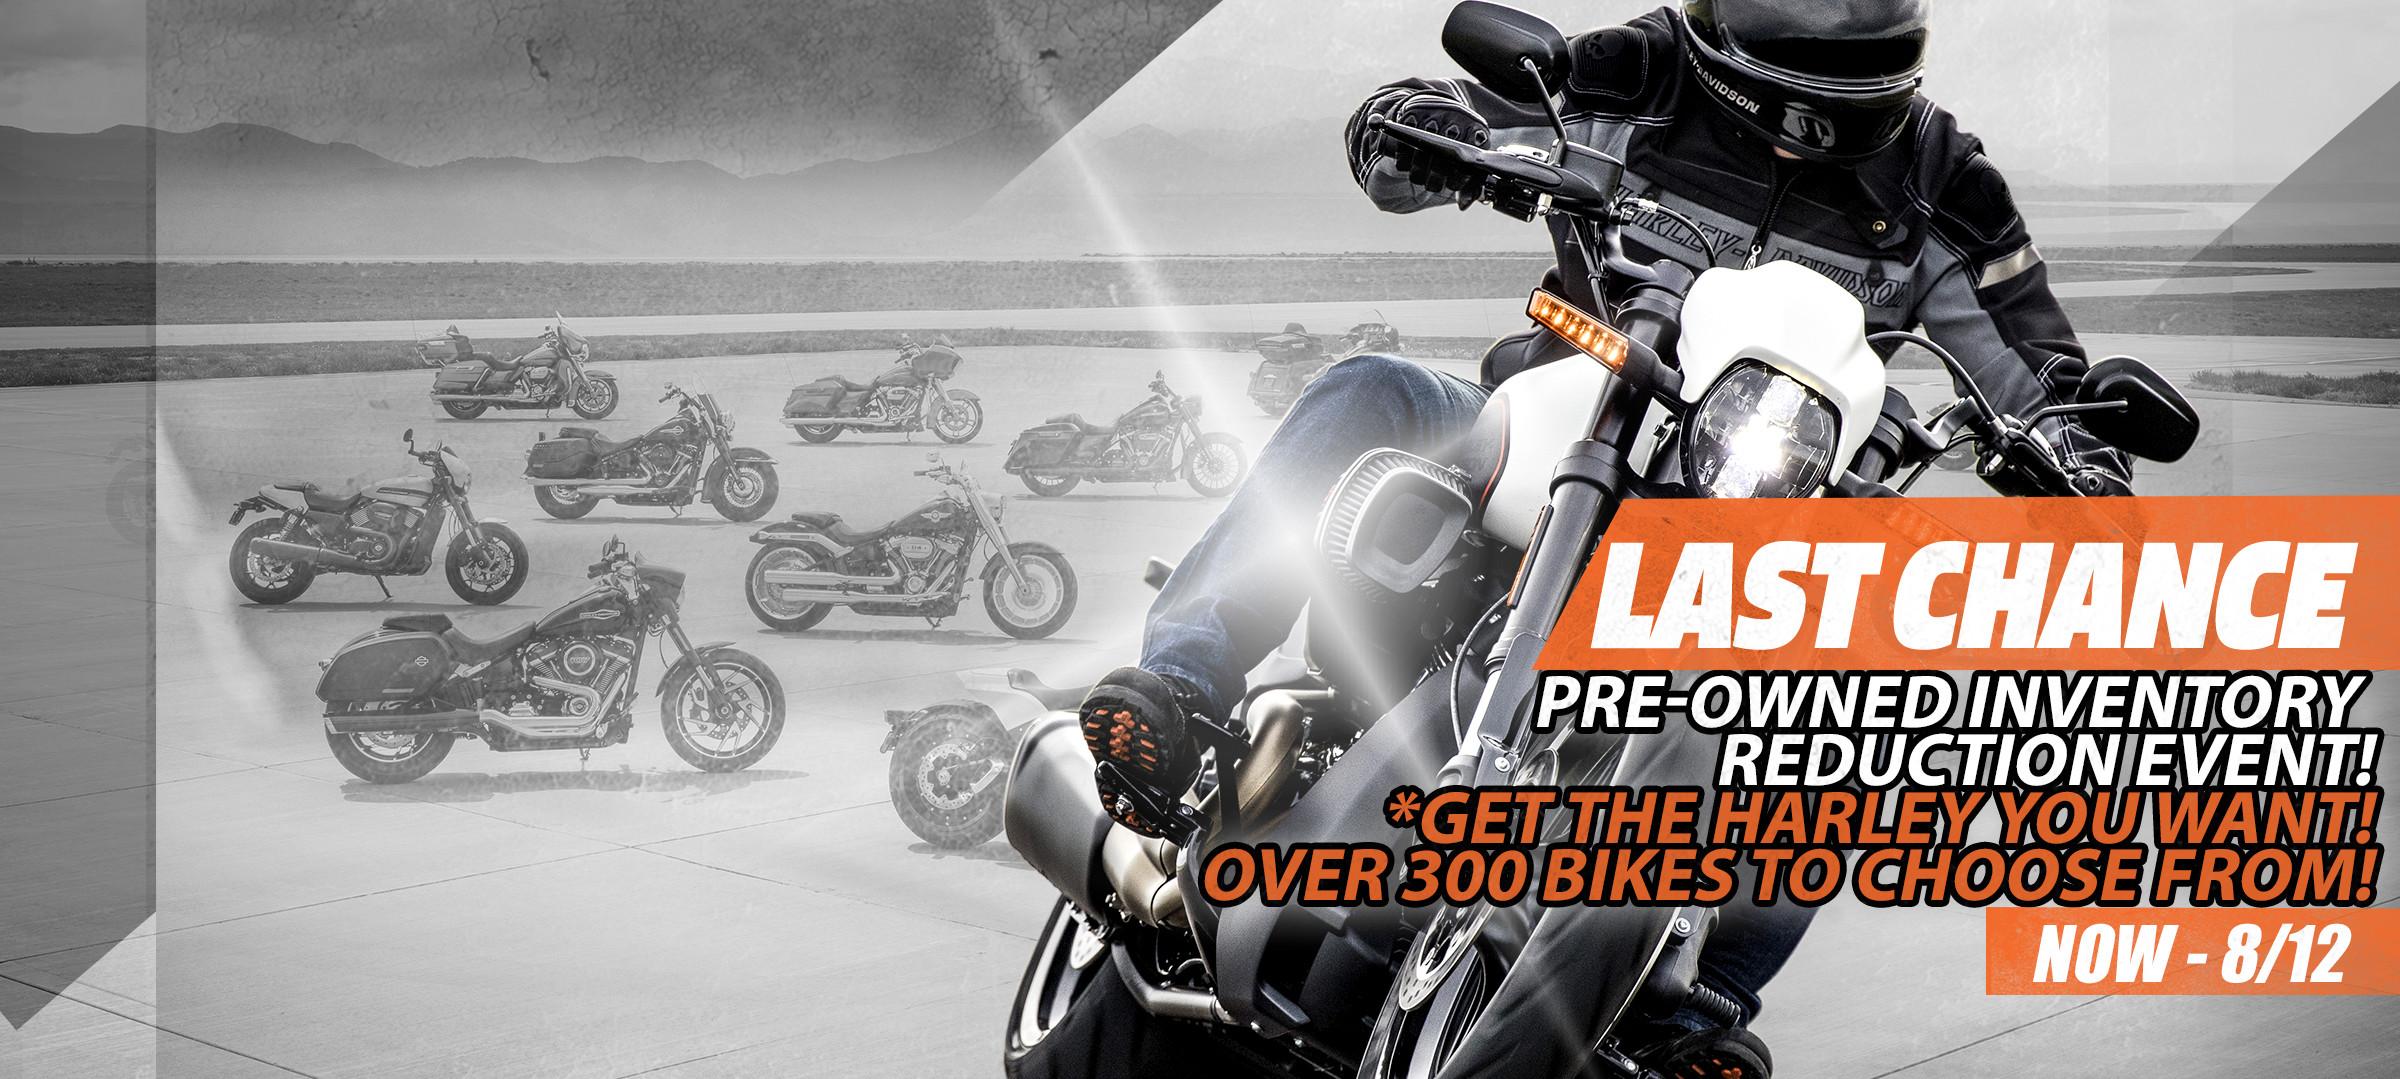 San Diego Harley-Davidson | Official Site | San Diego Harley-Davidson